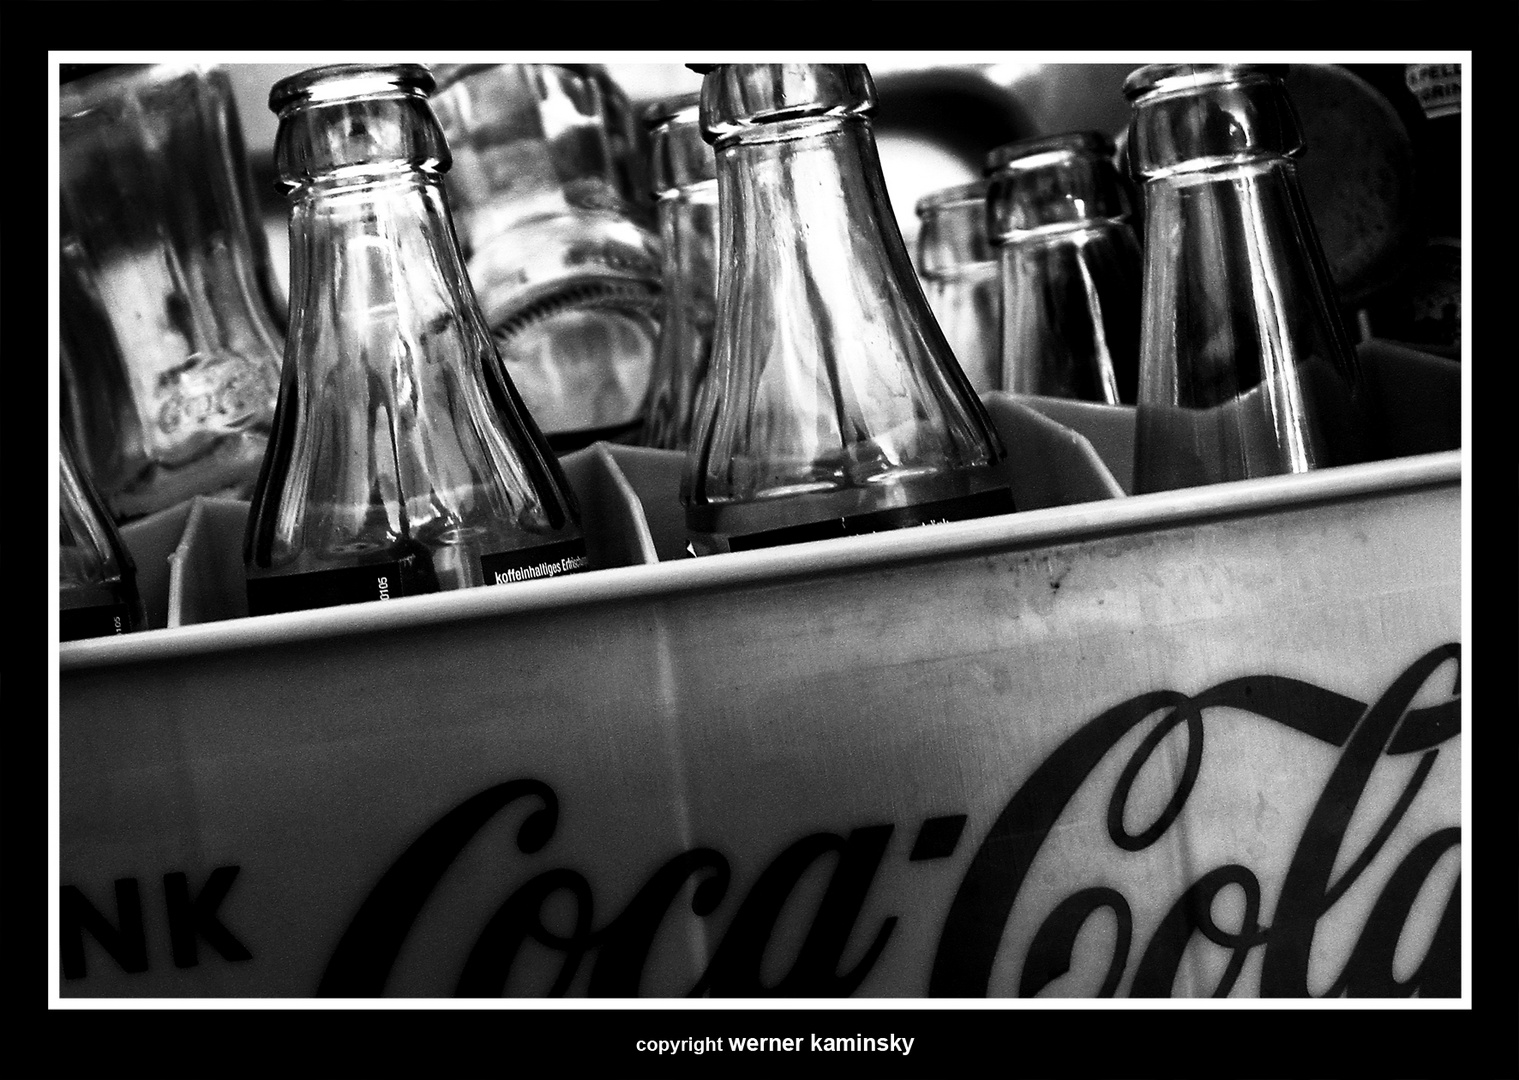 Ein Kultgetränk Foto & Bild | kunstfotografie & kultur, yak, coca ...